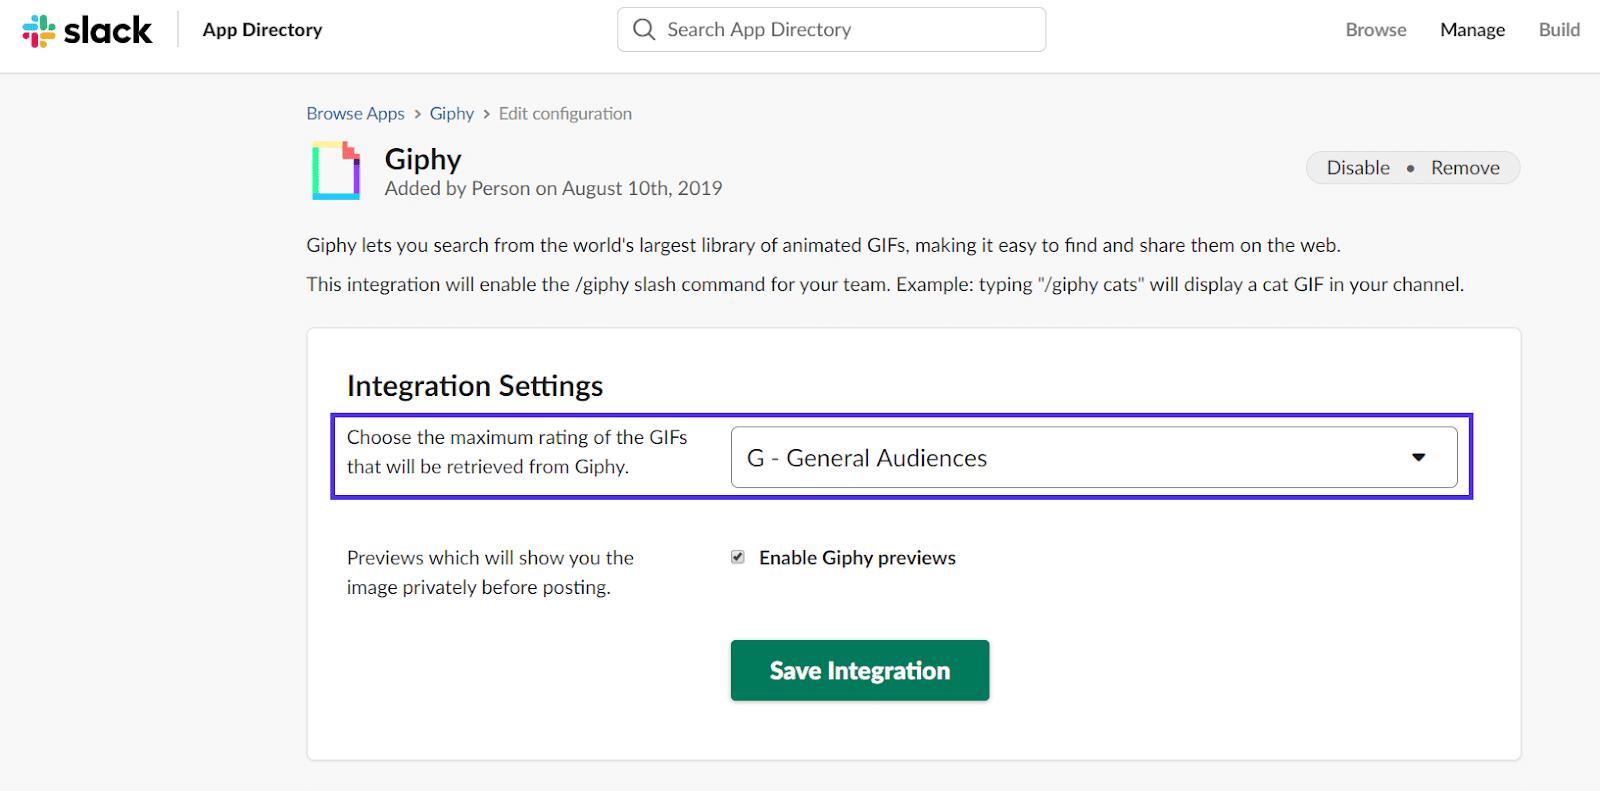 松弛giphy添加评分并保存